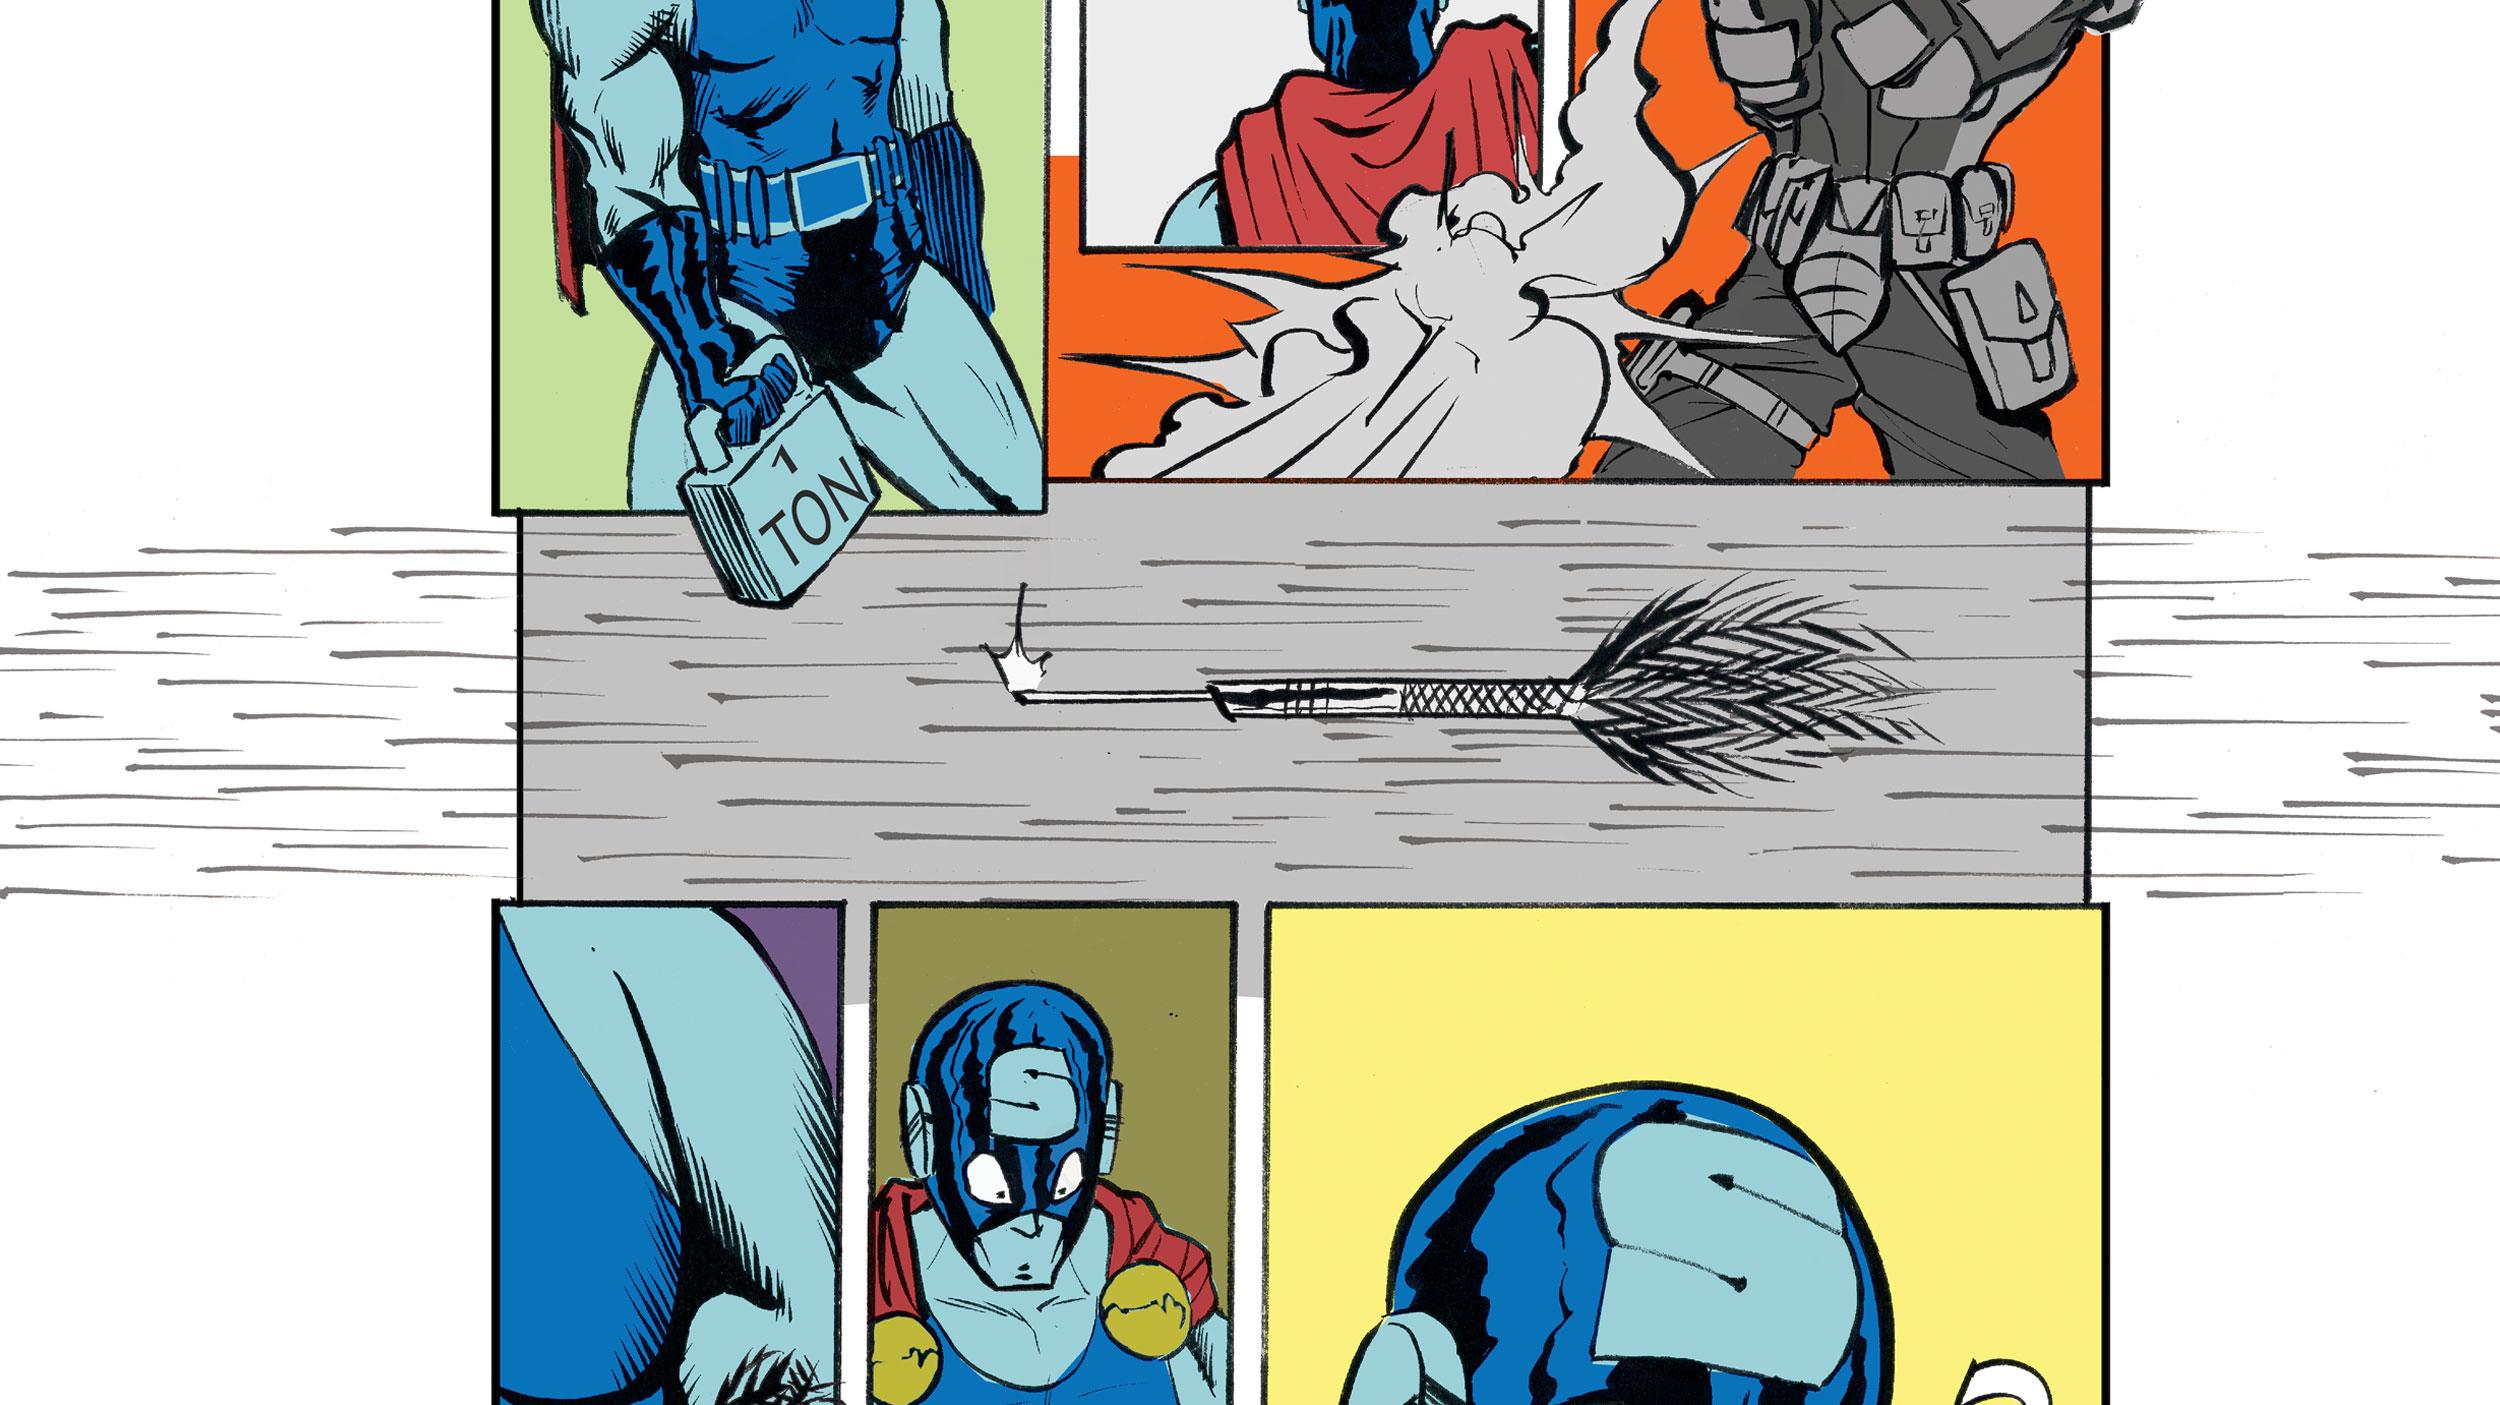 ted-joy-lin-superhero-strength-cognitive-07.jpg